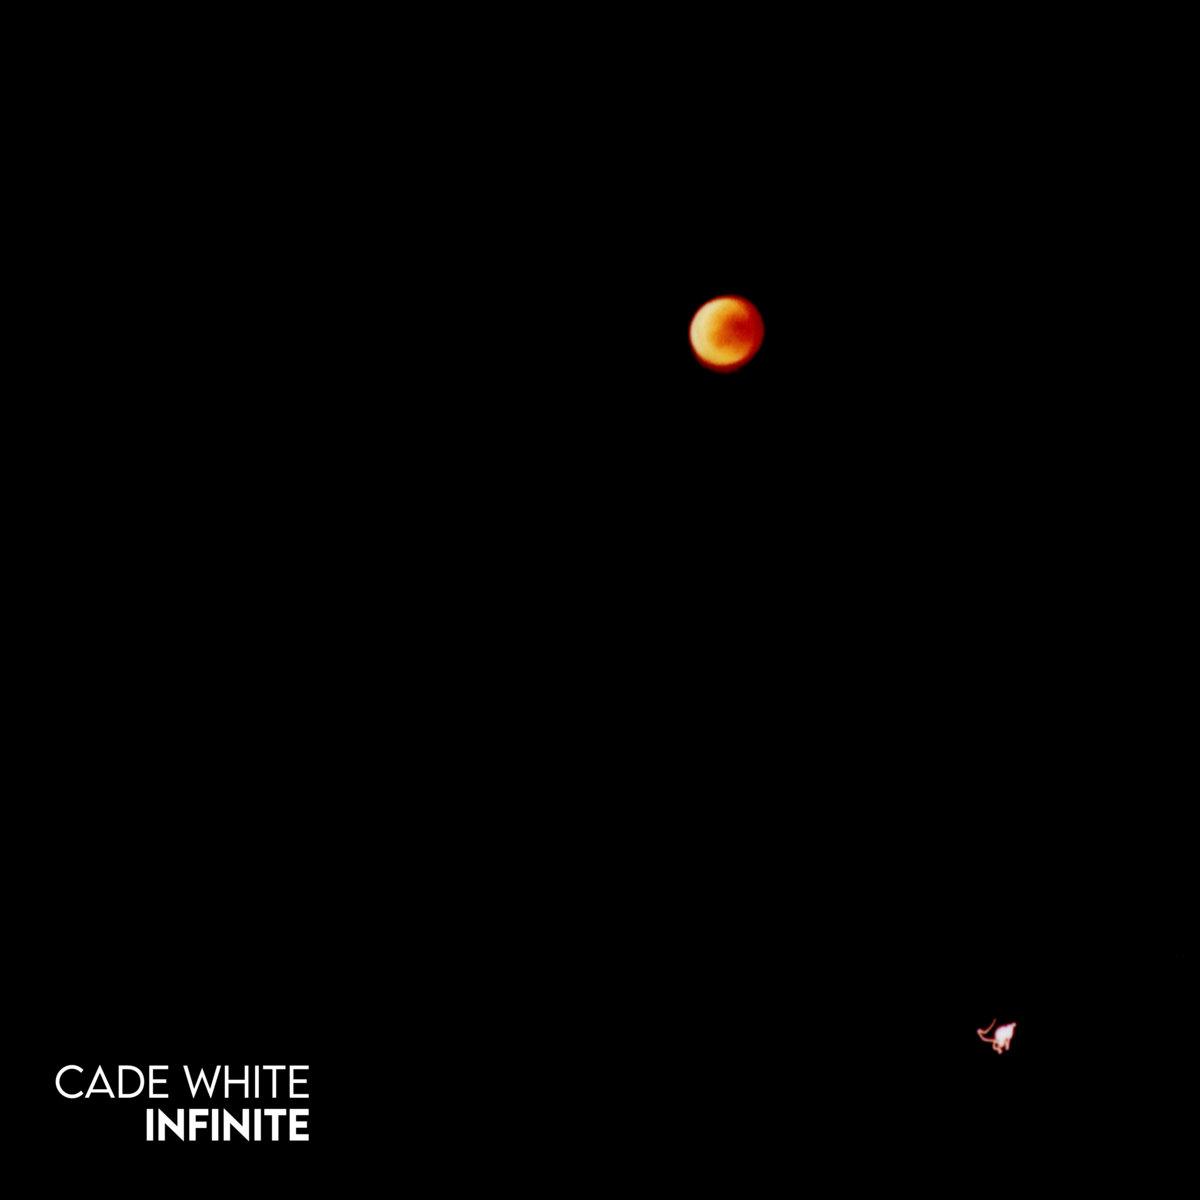 Cade White – Infinite (Single)